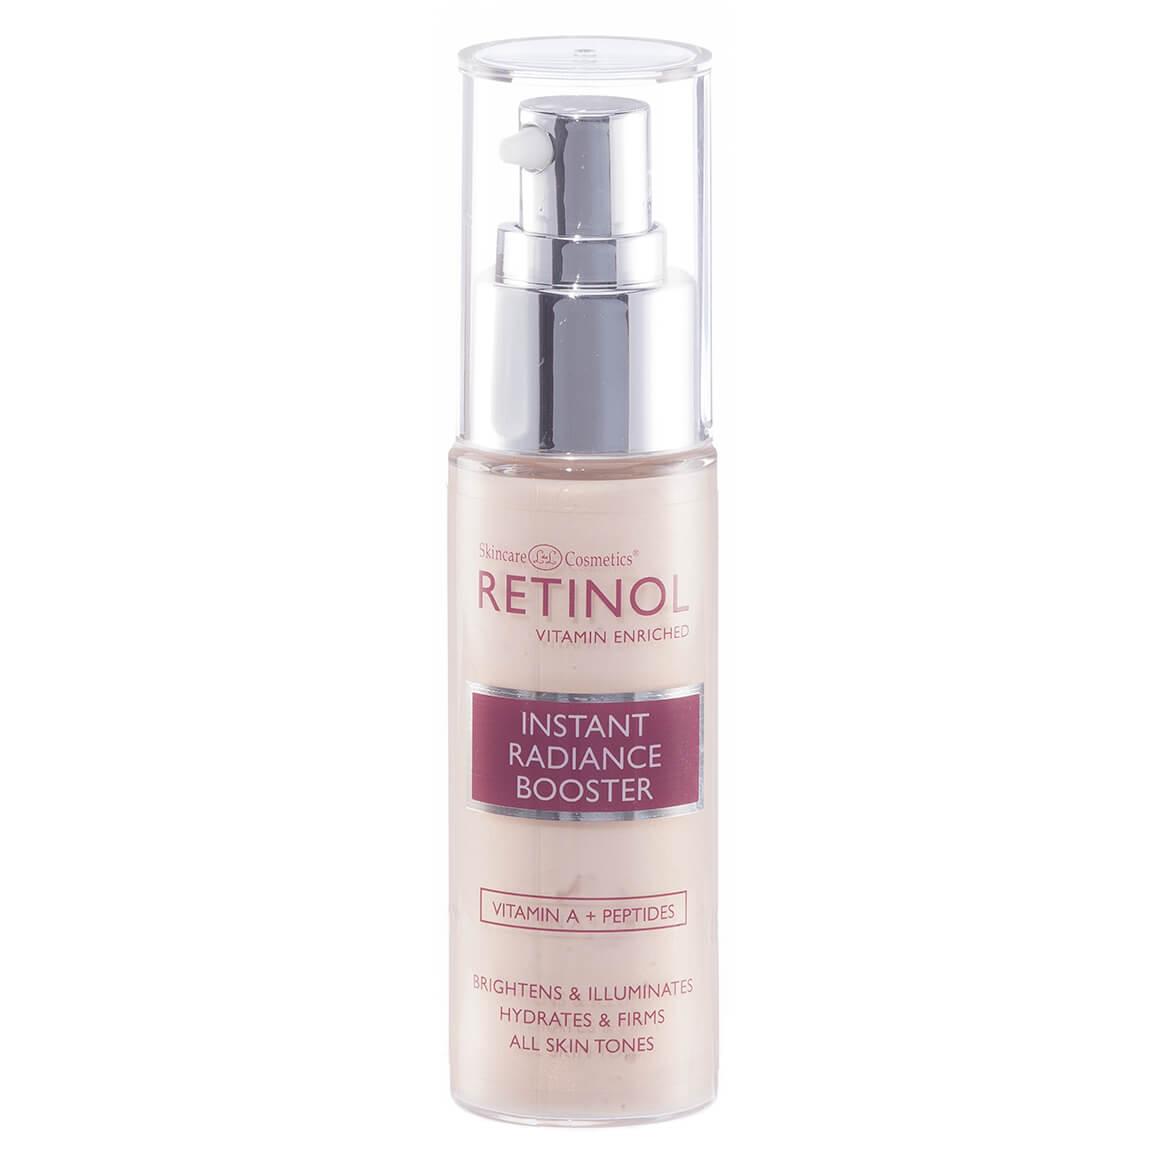 Skincare Cosmetics® Retinol Instant Radiance Booster